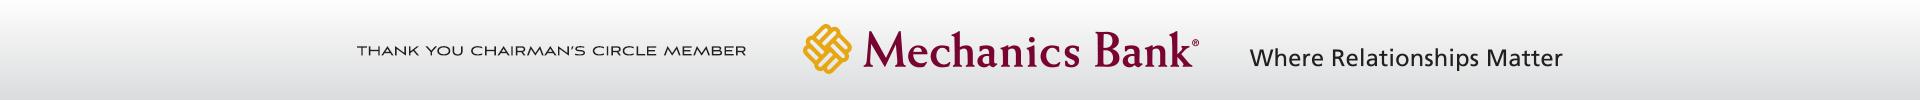 home-page-business-spotlight-Mechanics